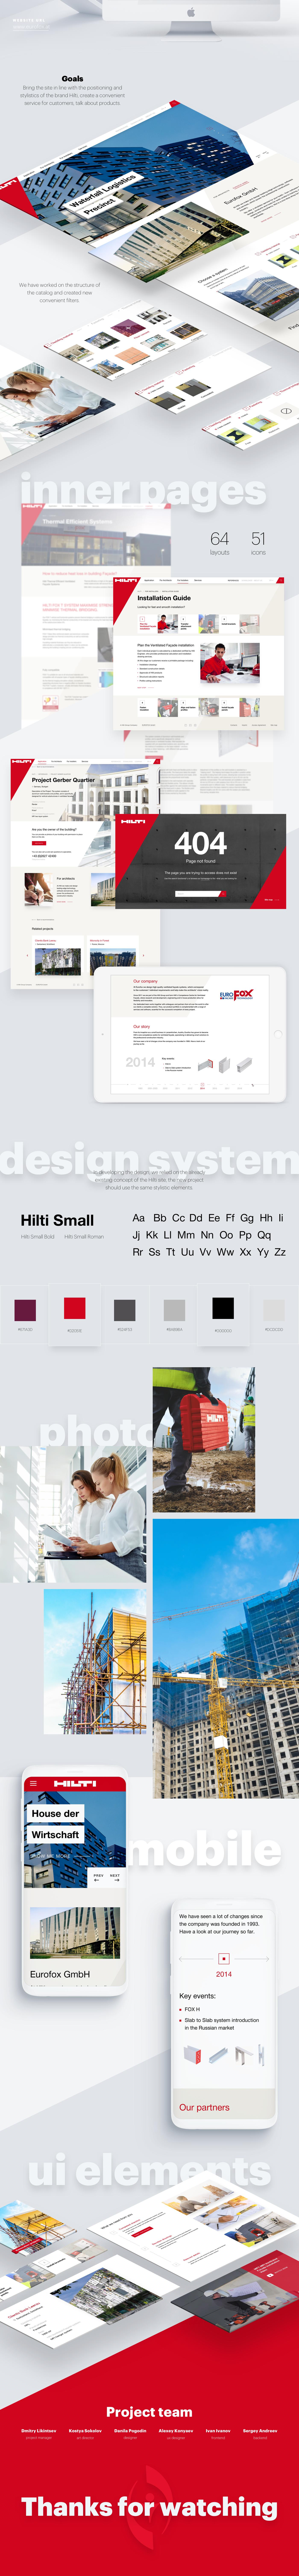 hilti,building,construction,architecture,Web